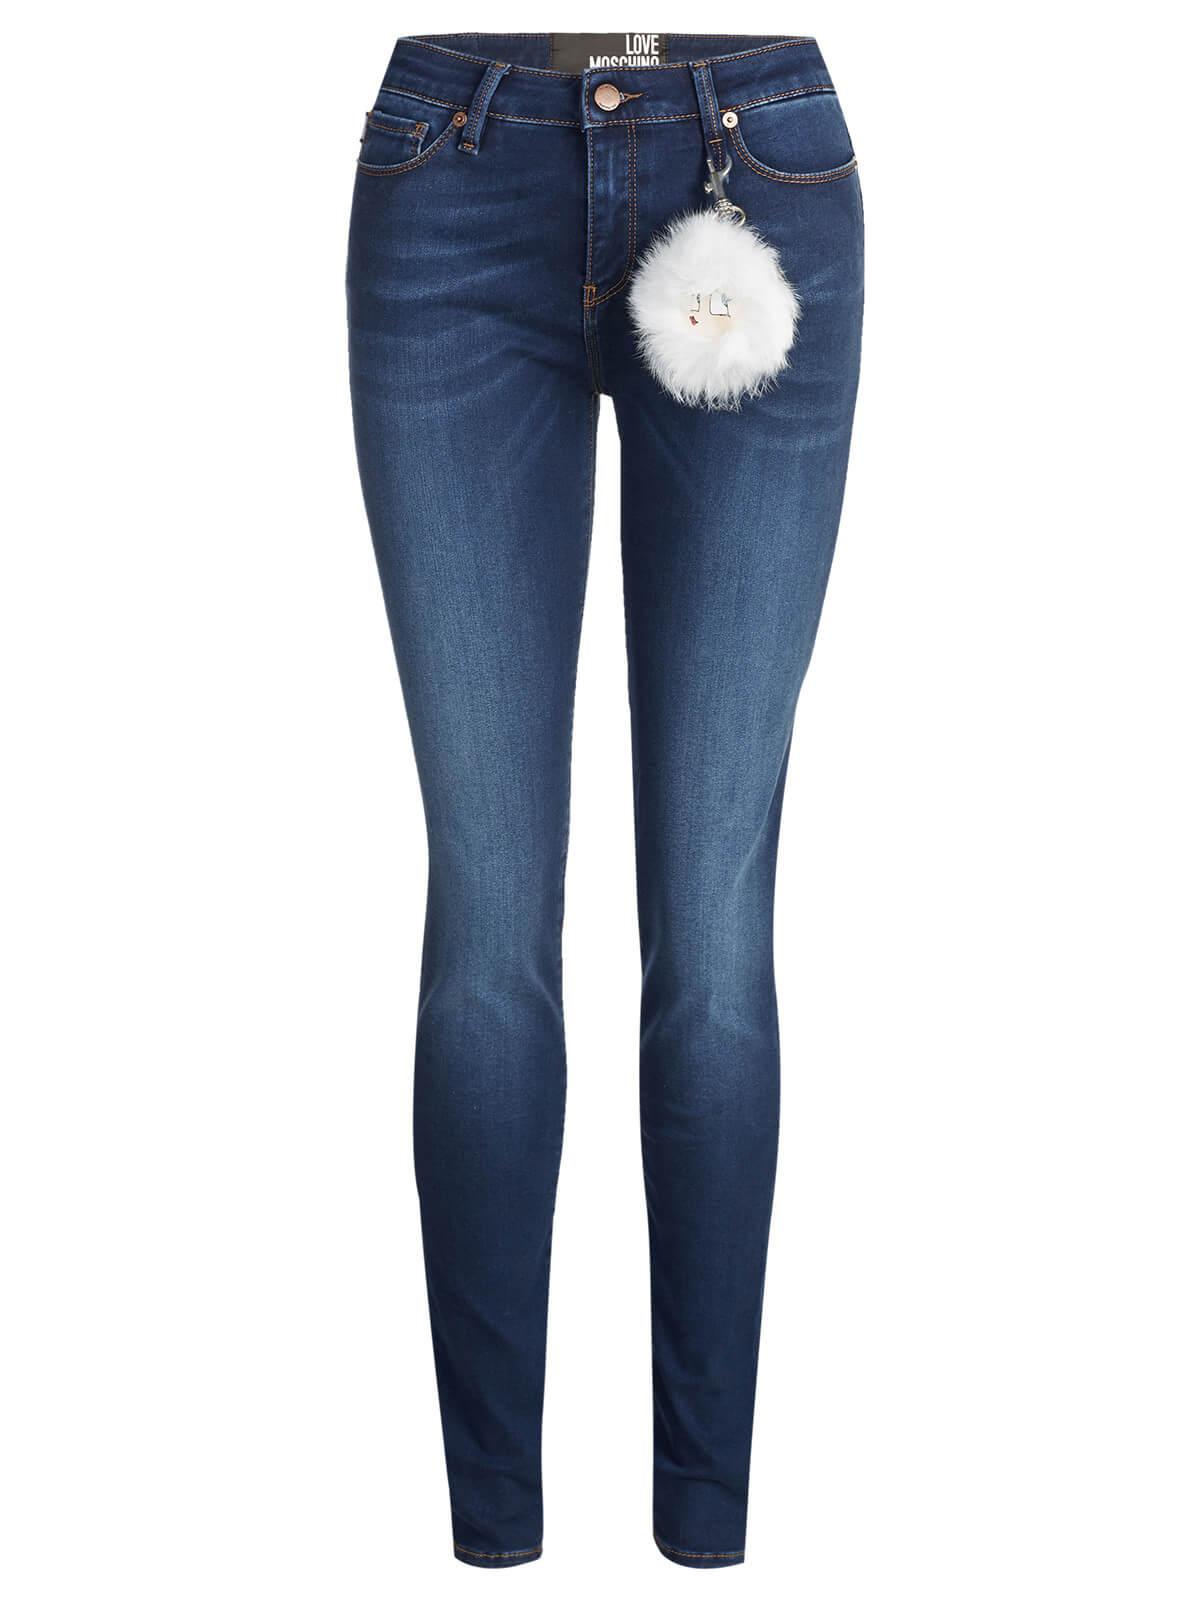 0ff3a5abab Love Moschino Jeans dark blue